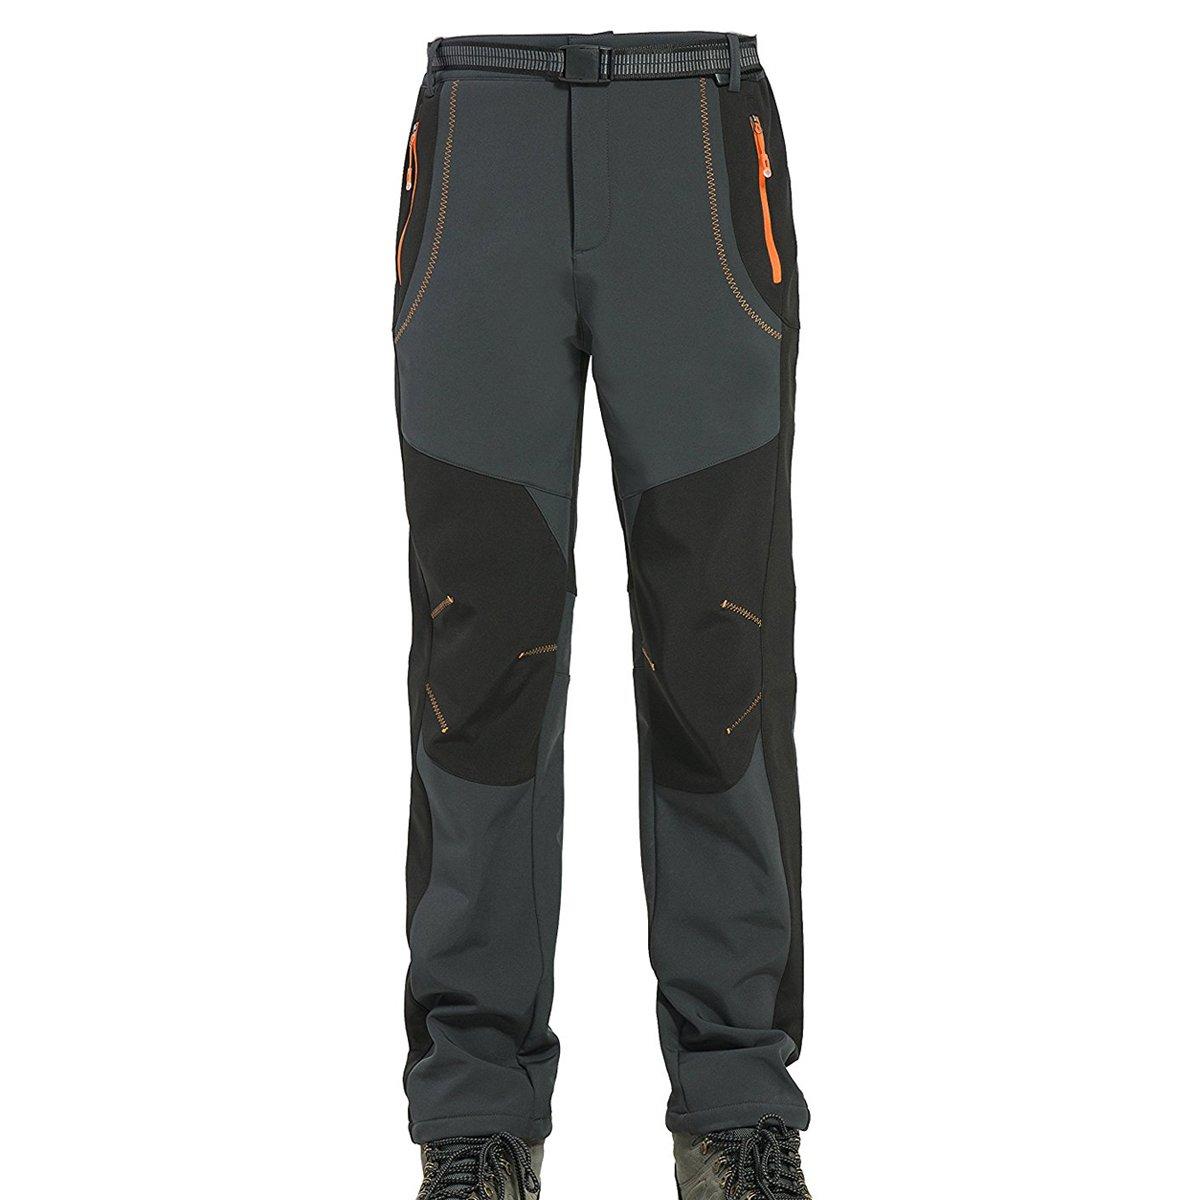 Facecozy Men's Outdoor Snow Ski Waterproof Soft Shell Pants Male Hiking Fleece Lined Trousers